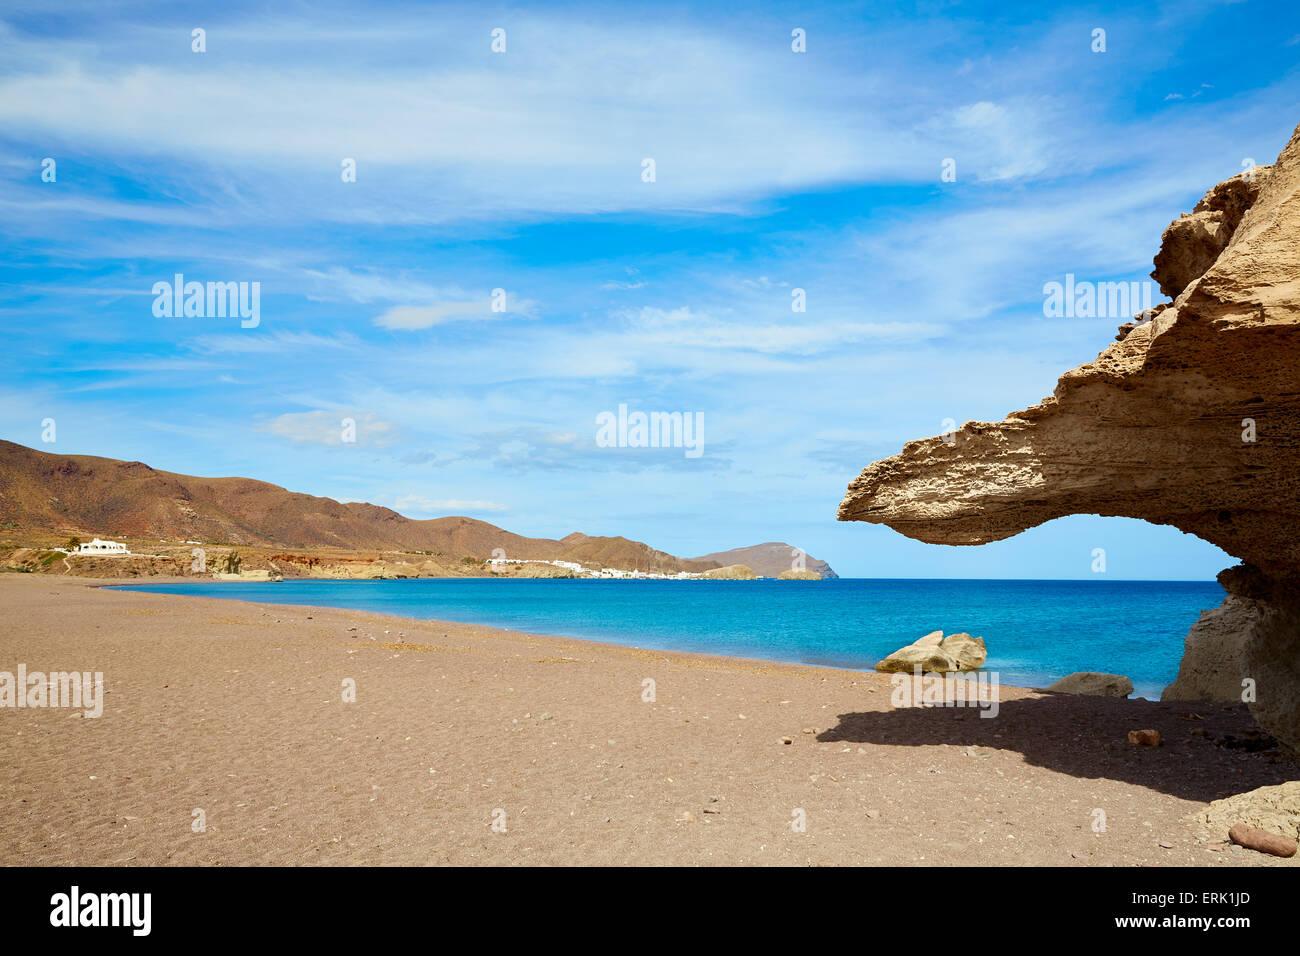 Almeria in cabo de gata playa del arco arch beach at spain for Cabo de gata spain